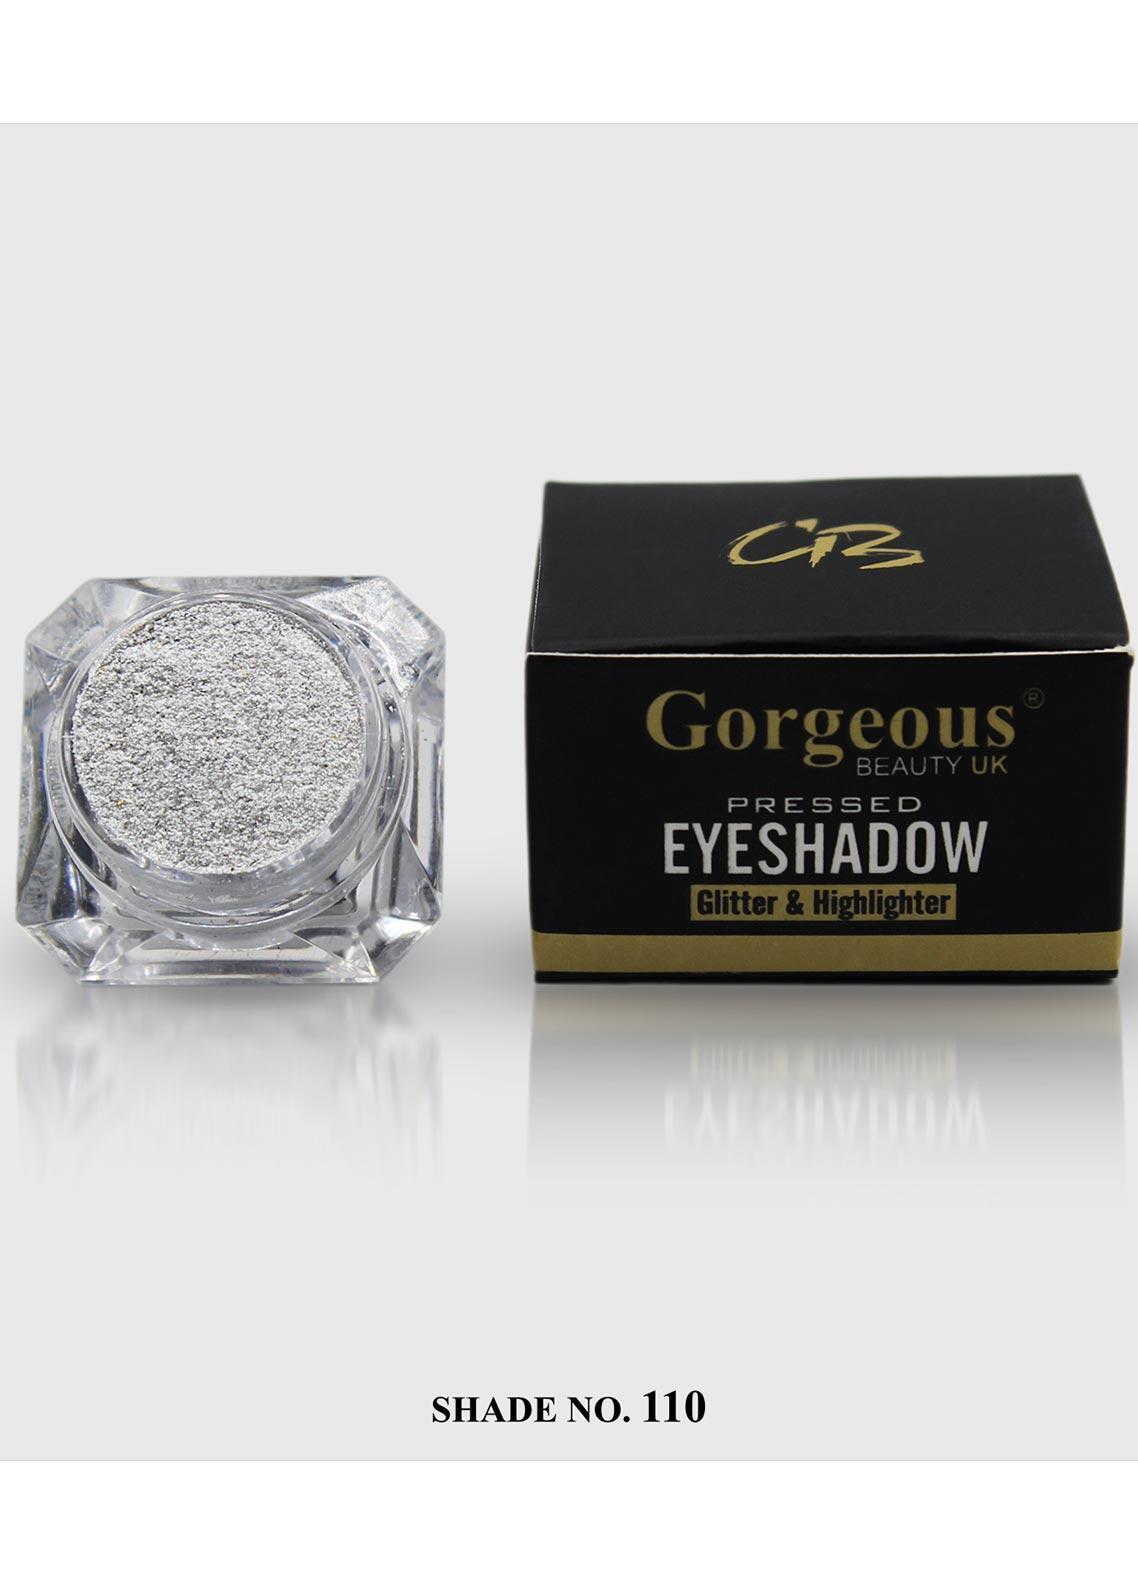 Pressed Eye Shadow Glitter & Highlighter-110